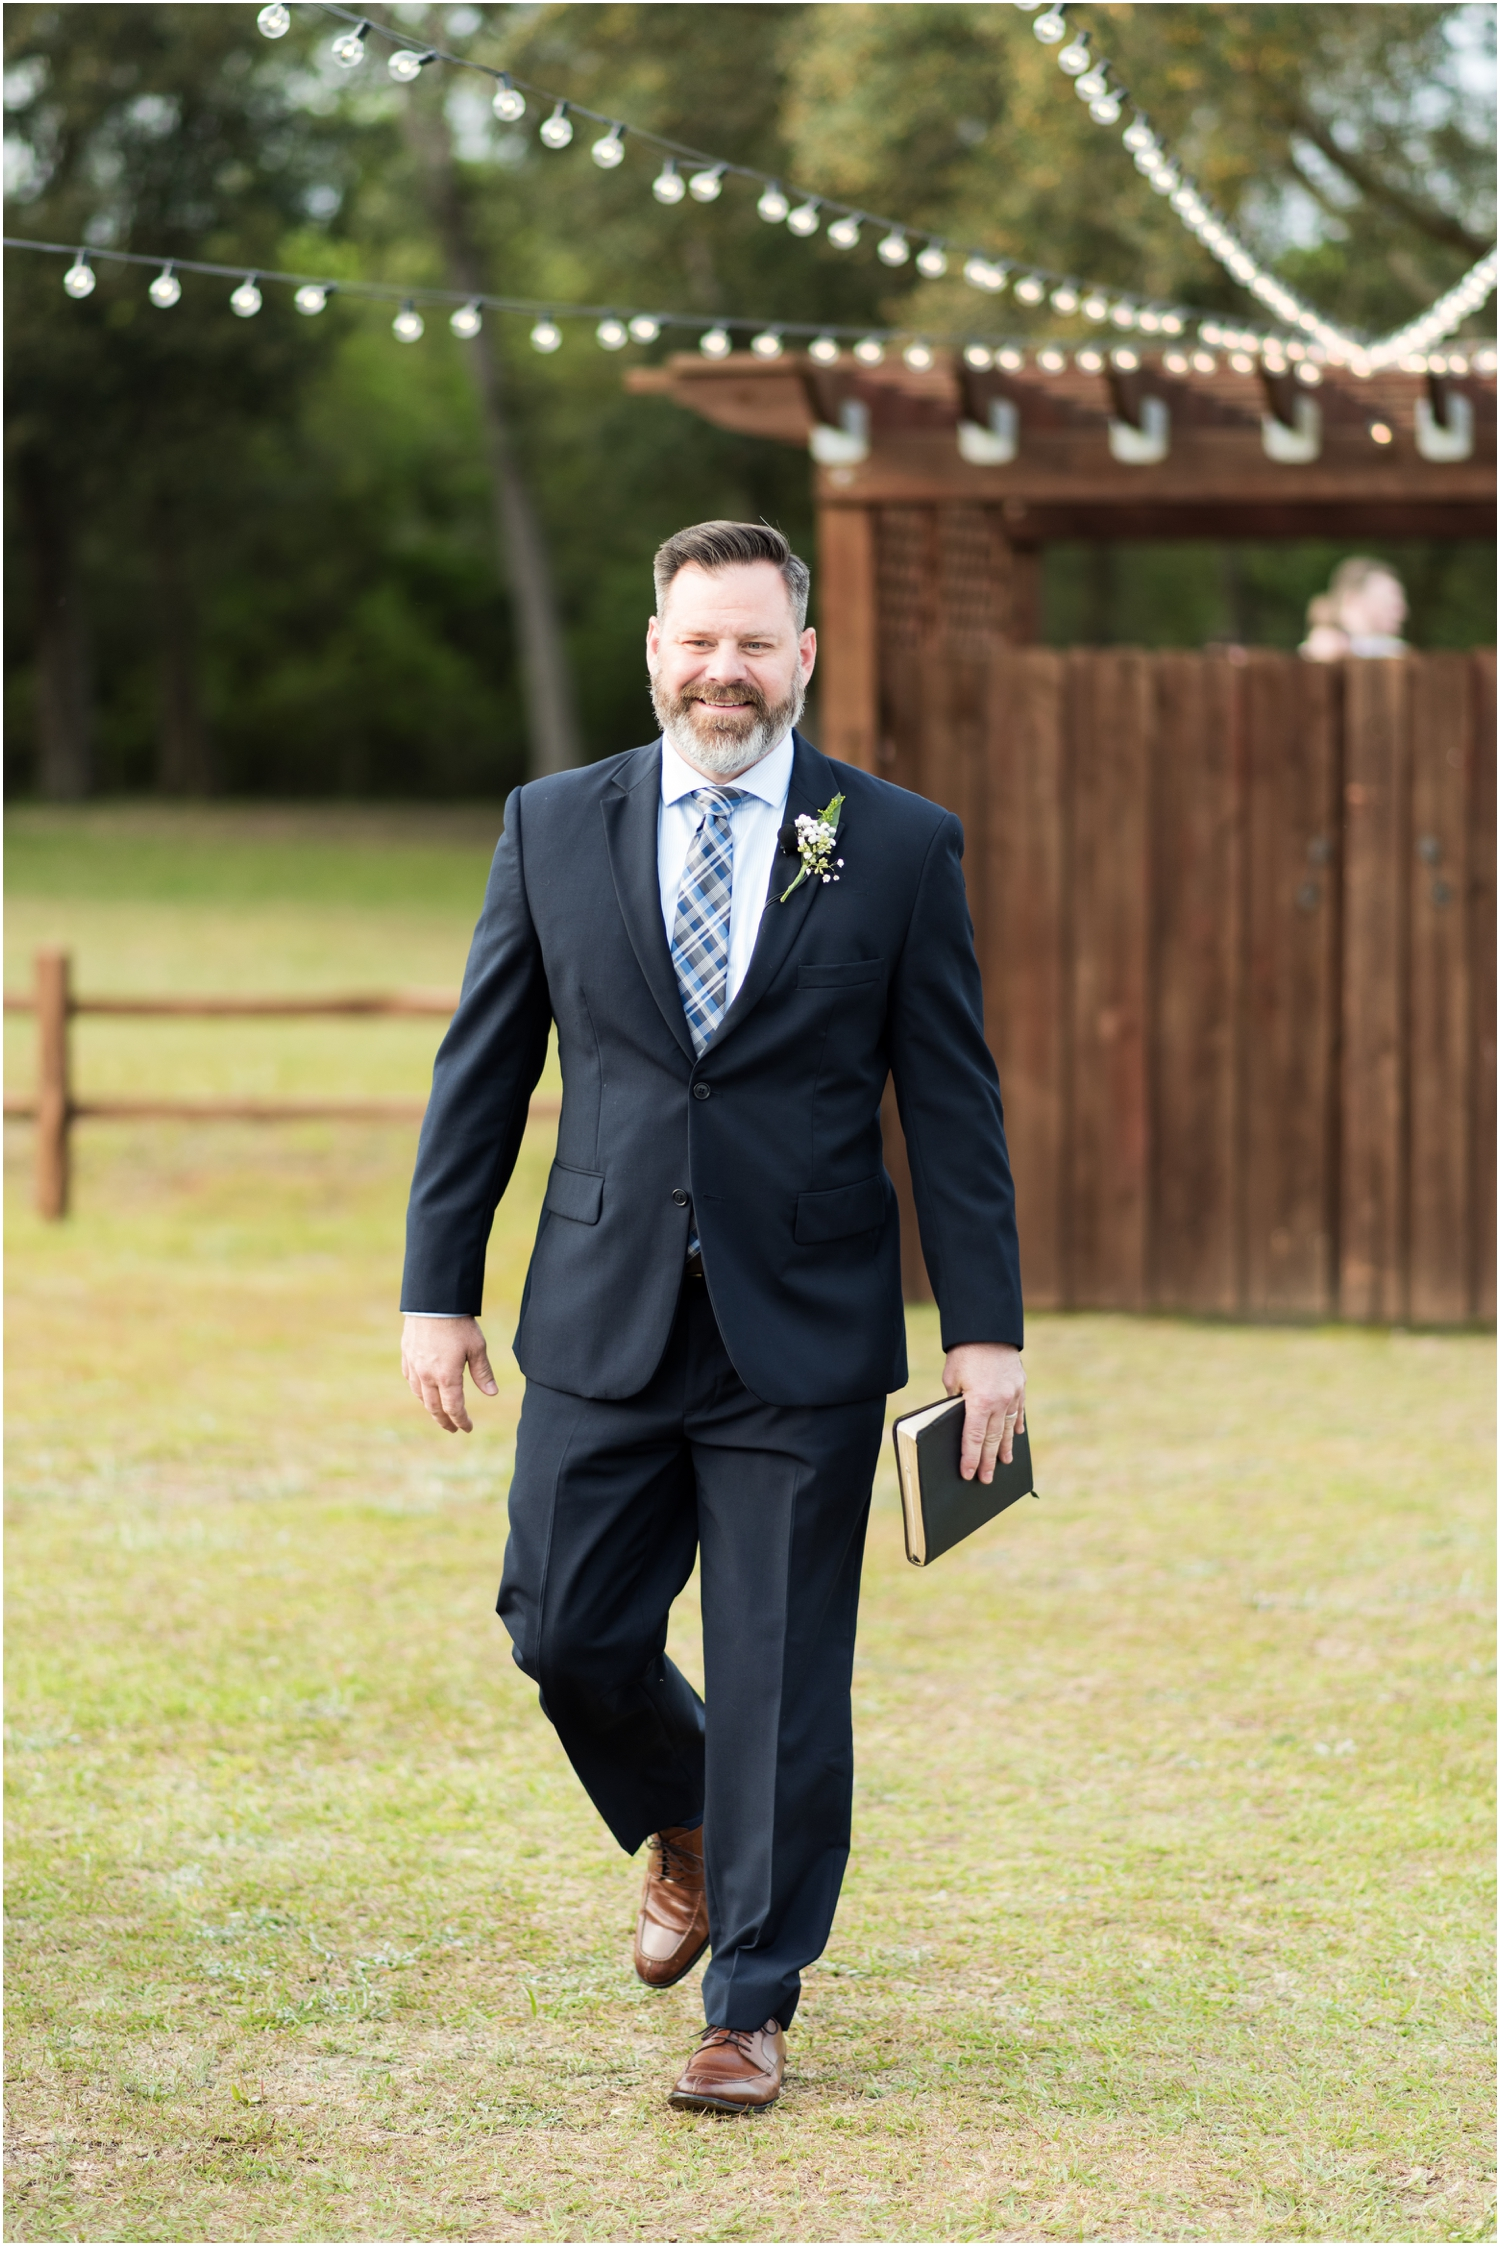 Sowell Farms Milton Florida Rustic Woodsy Barn Wedding Photographer ceremony details